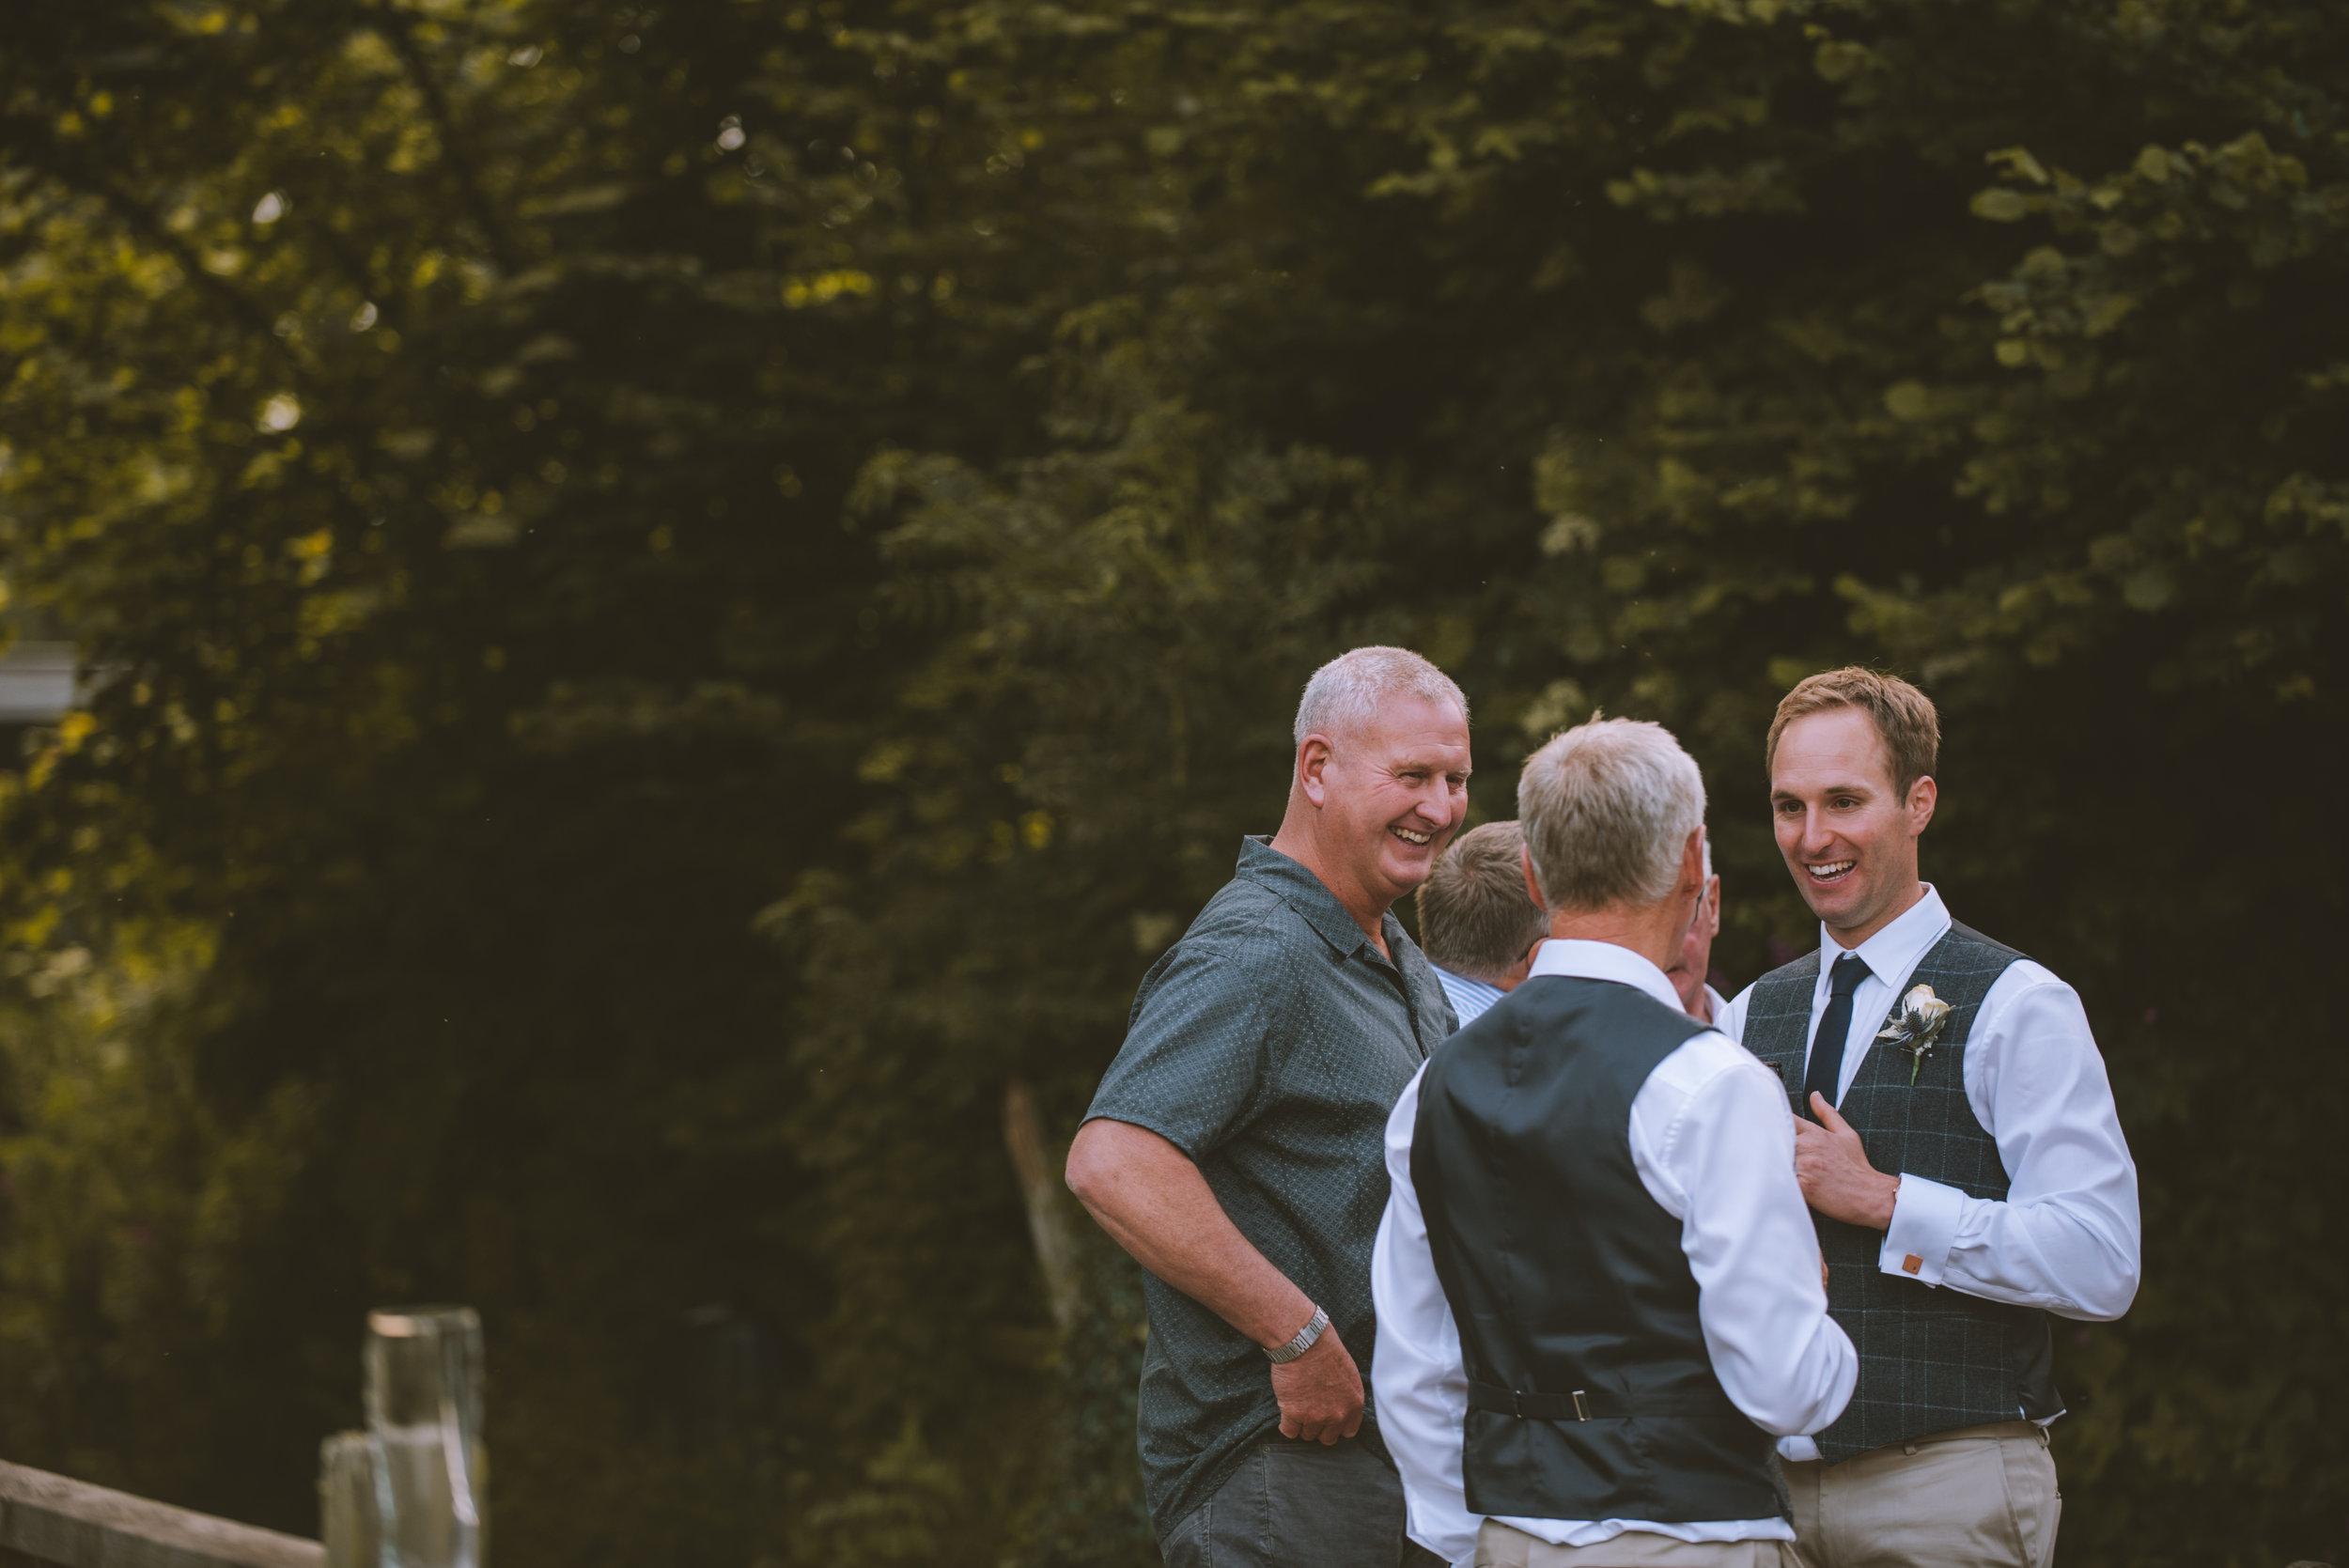 wedding-photographer-nancarrow-56.jpg